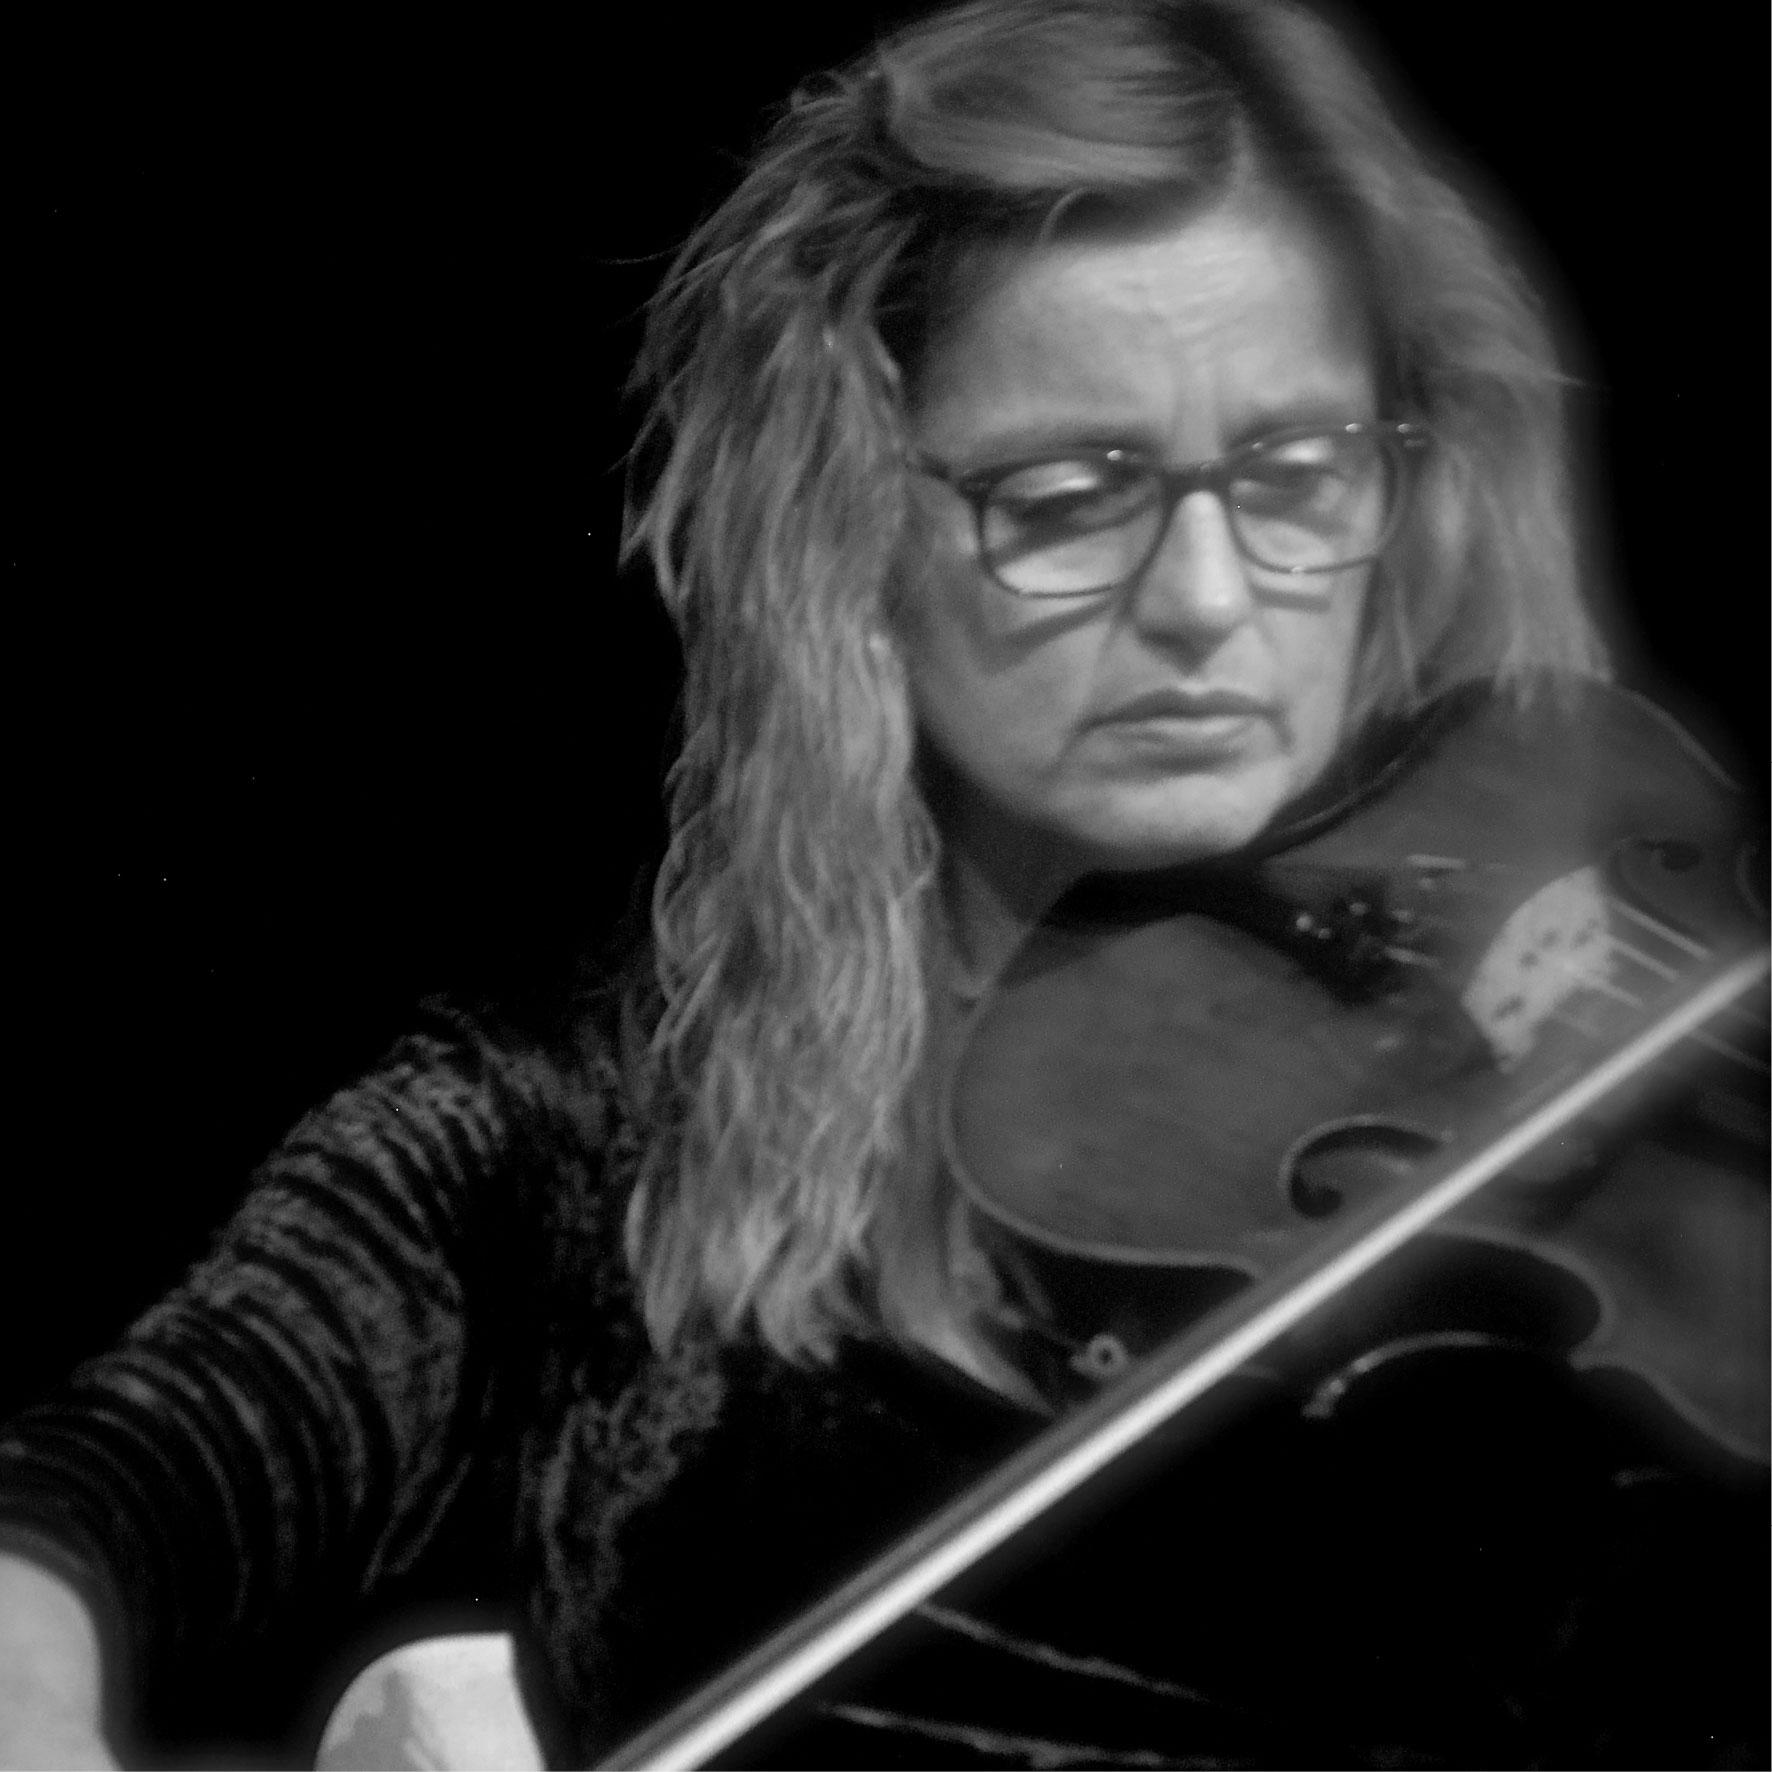 Francesca Levorato